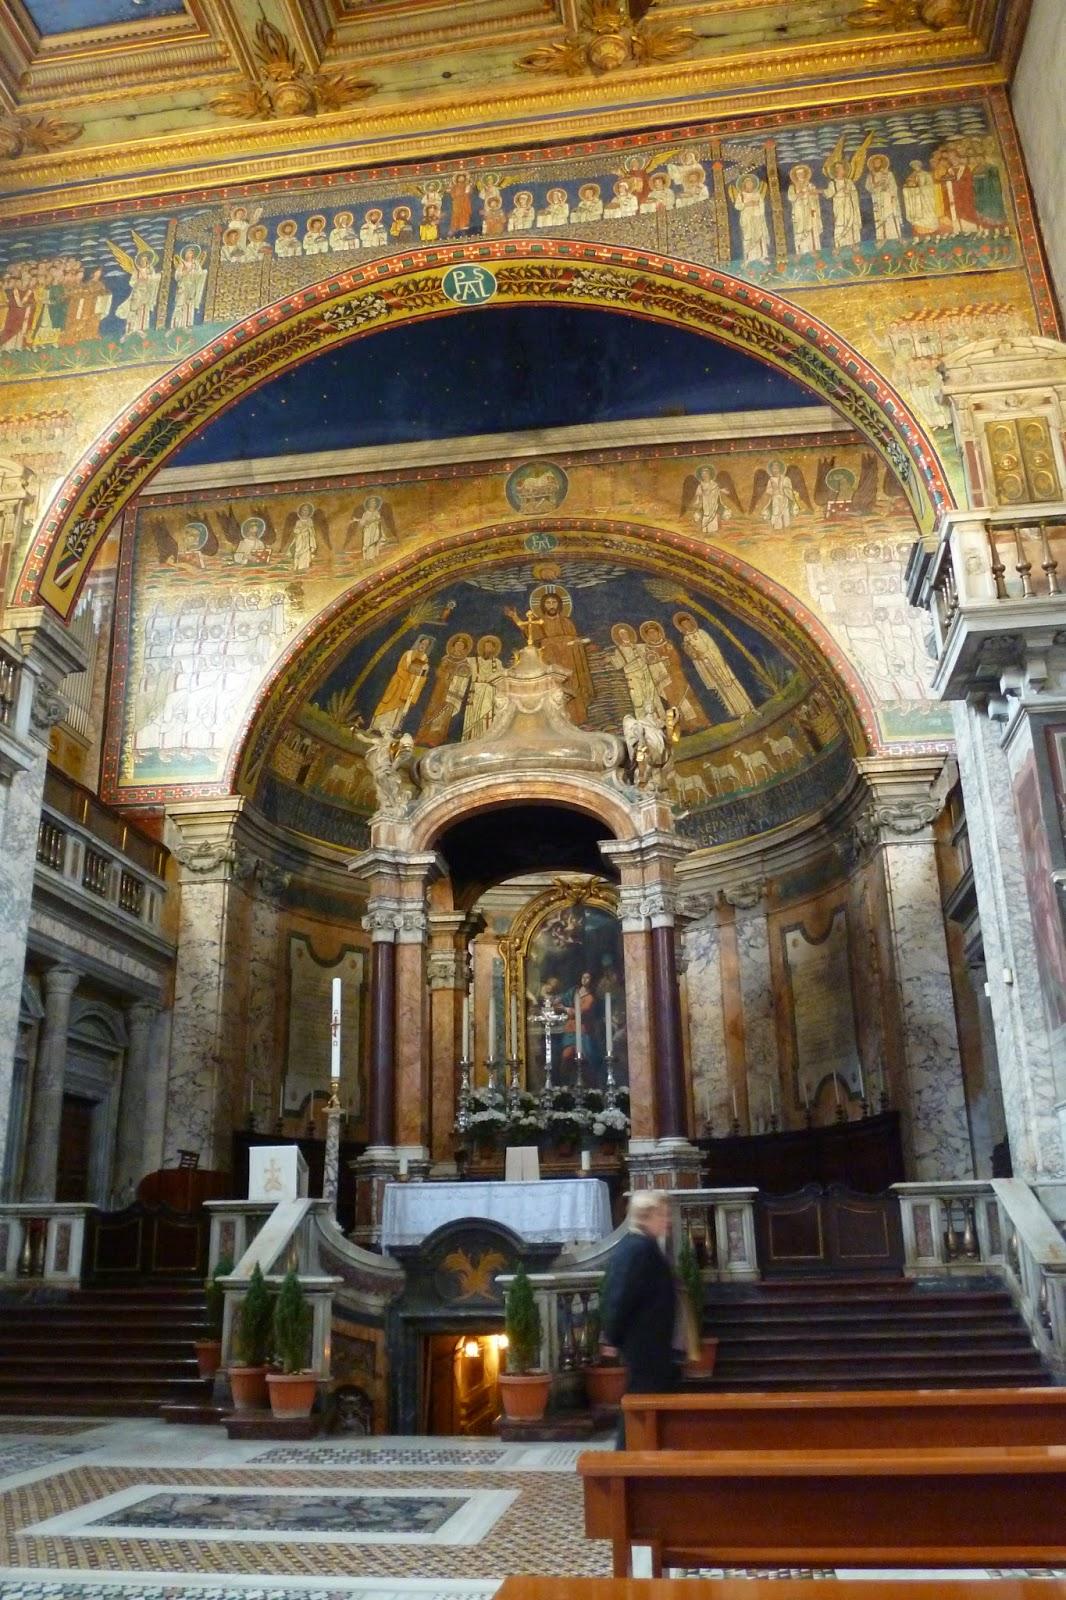 Igreja de Roma Santa Prassede, arco triunfal